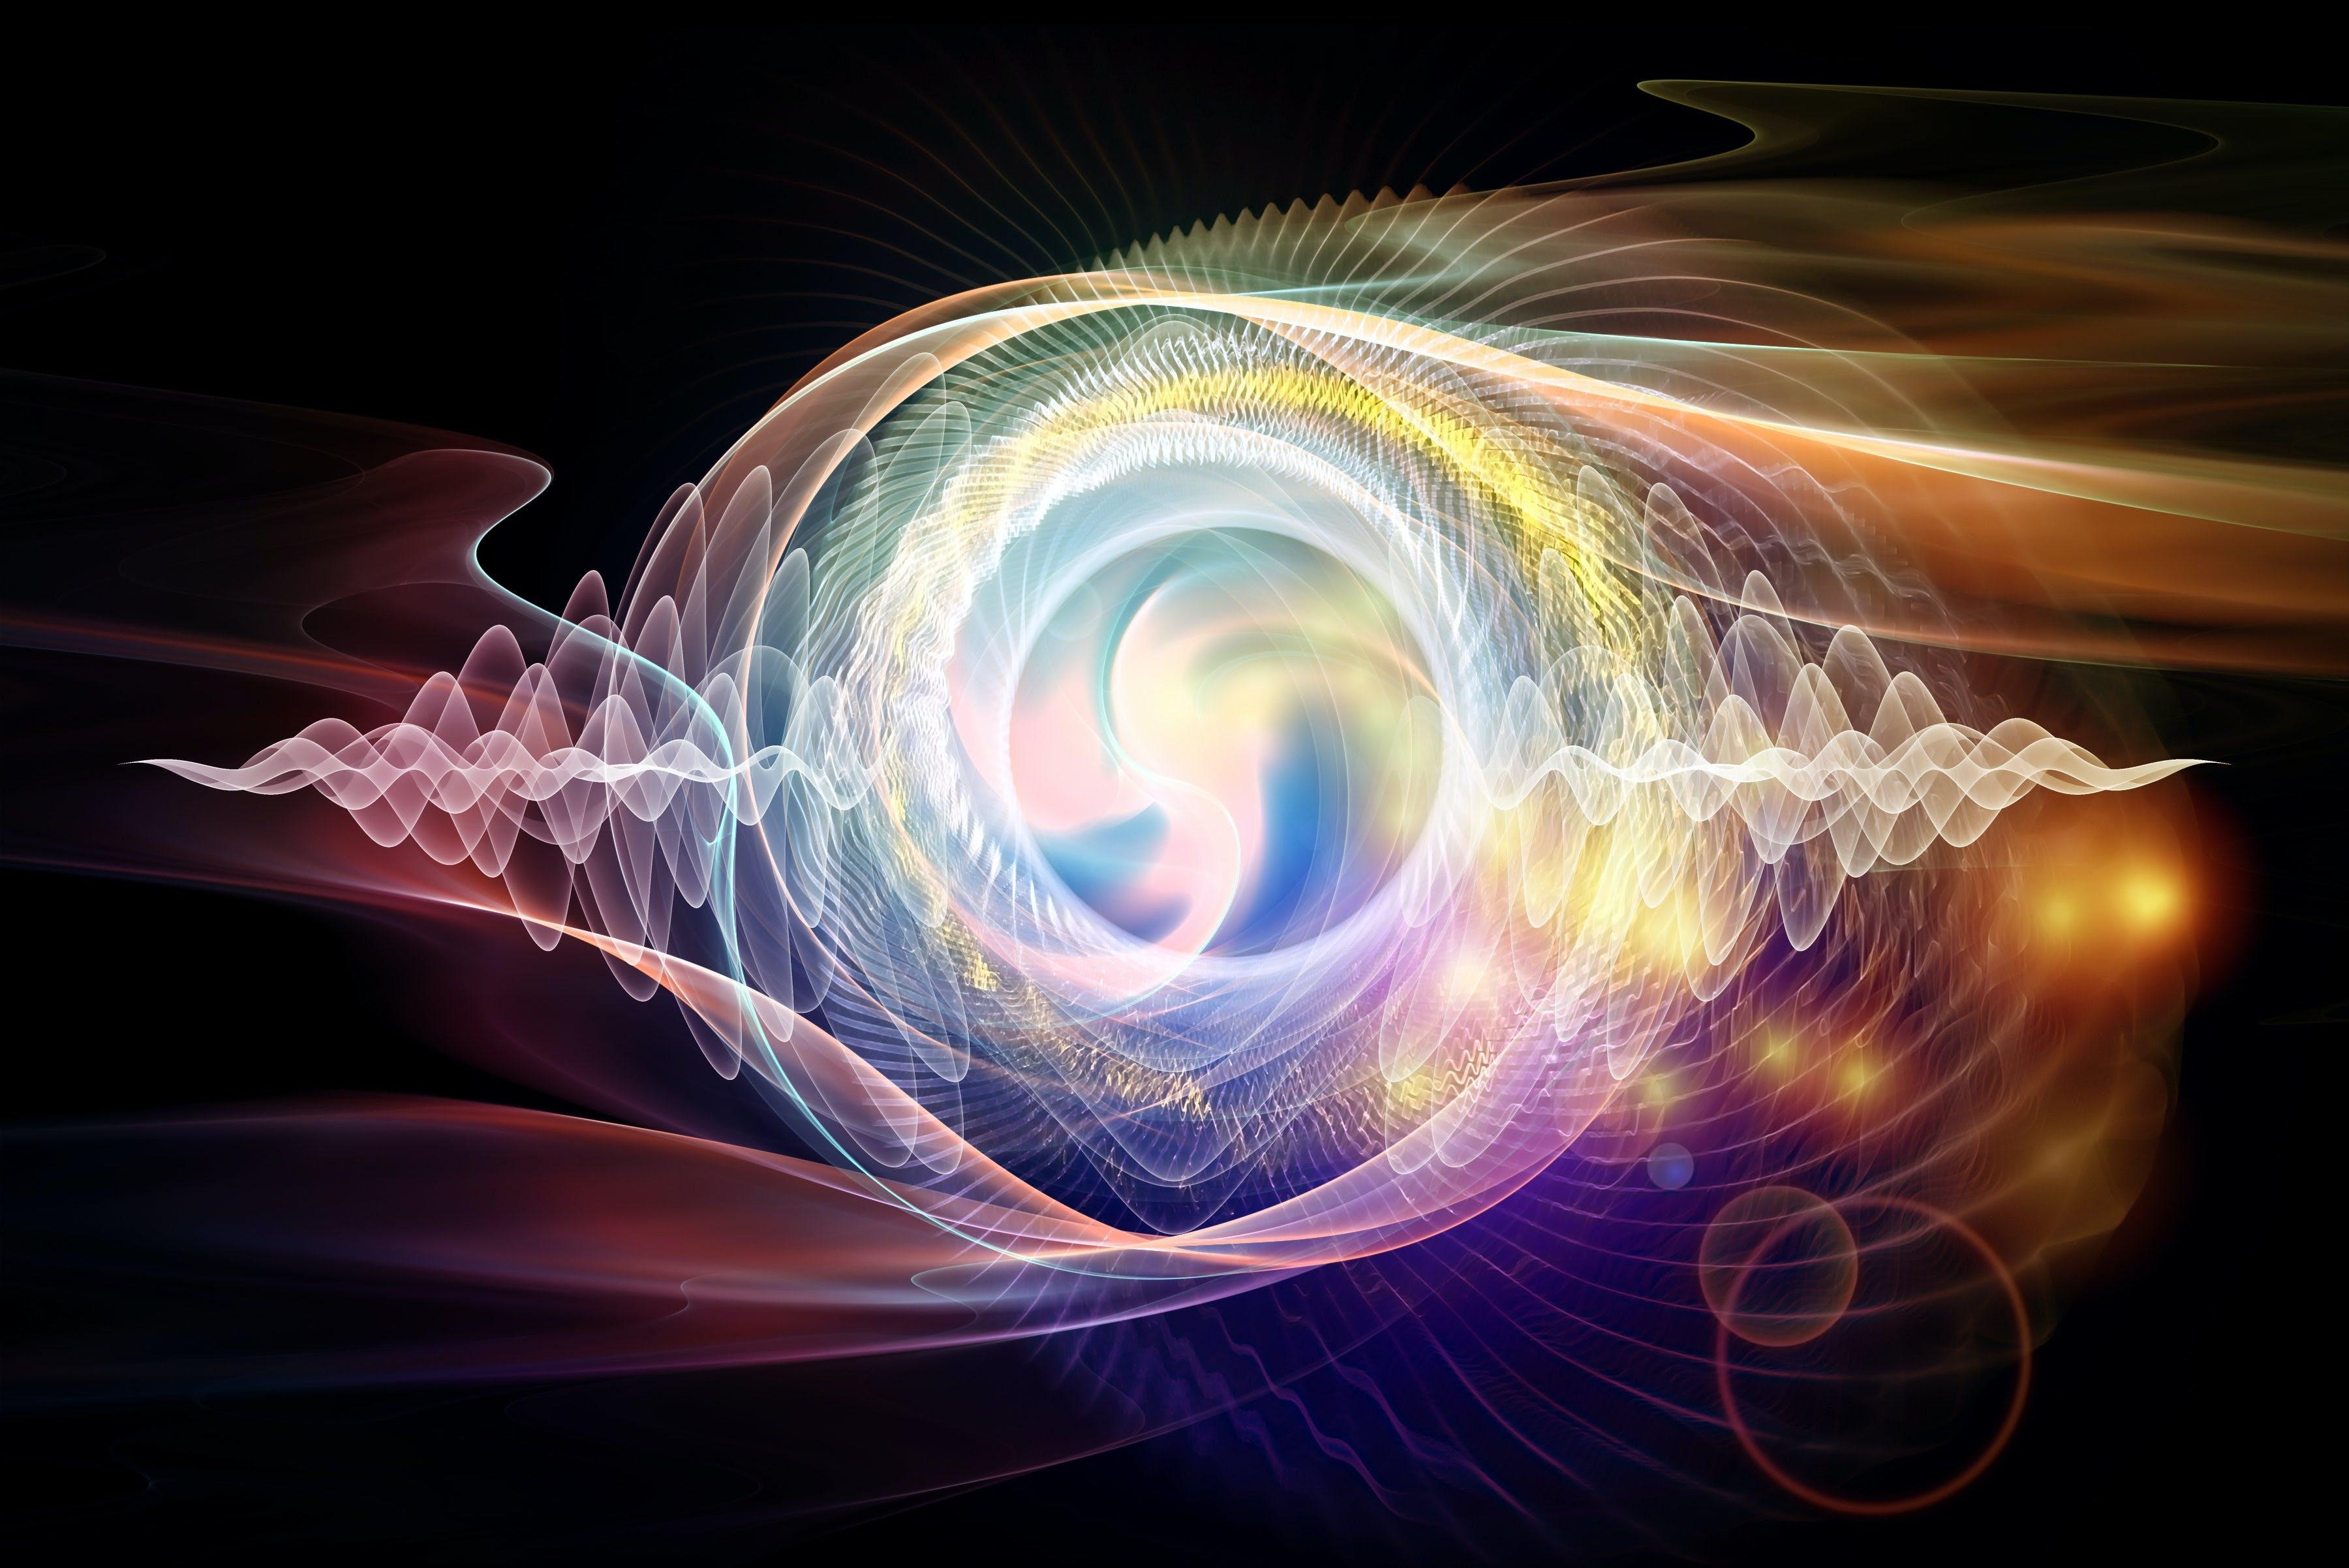 kvantemekanik